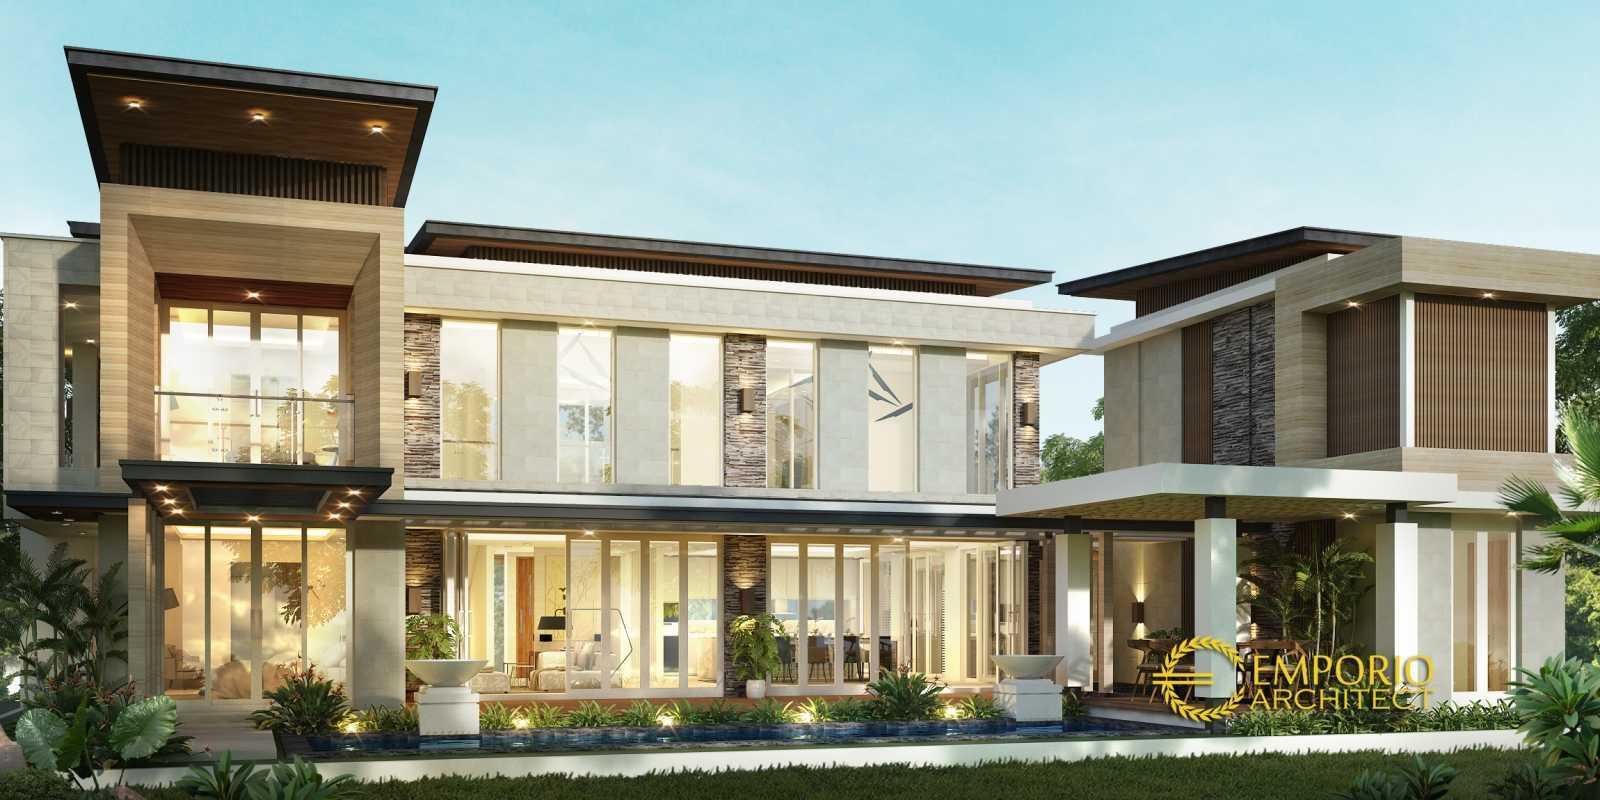 Emporio Architect Desain Rumah Modern Tropis 509 @ Bogor Bogor, Jawa Barat, Indonesia Bogor, Jawa Barat, Indonesia Emporio-Architect-Desain-Rumah-Modern-Tropis-509-Bogor   77568